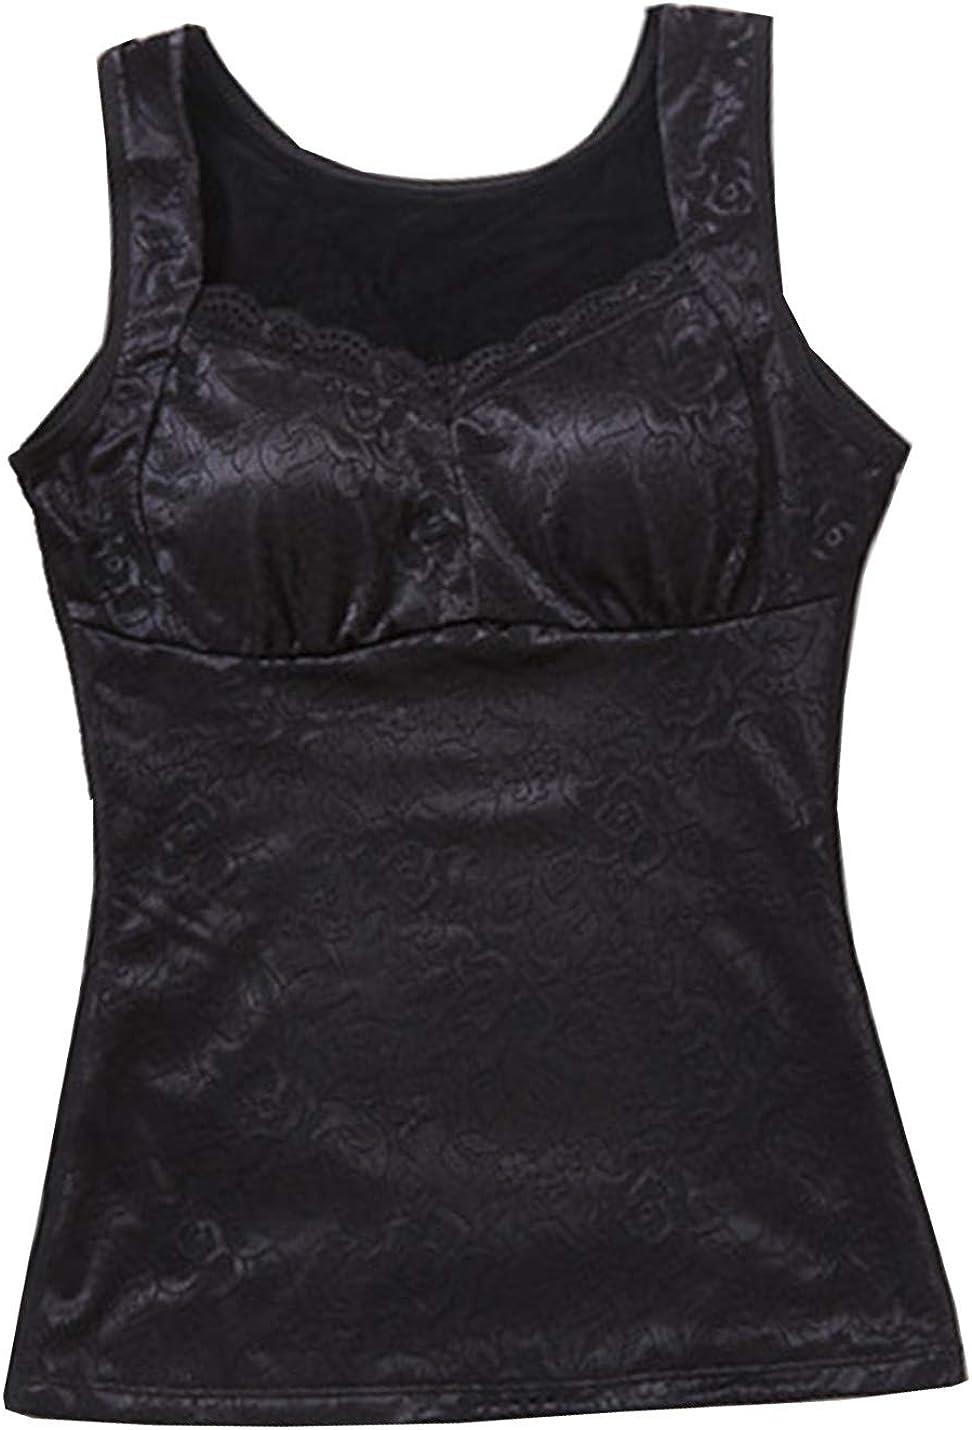 Flygo Women's Thermal Camisole Fleece Lined Underwear Cami Tank Tops Vest